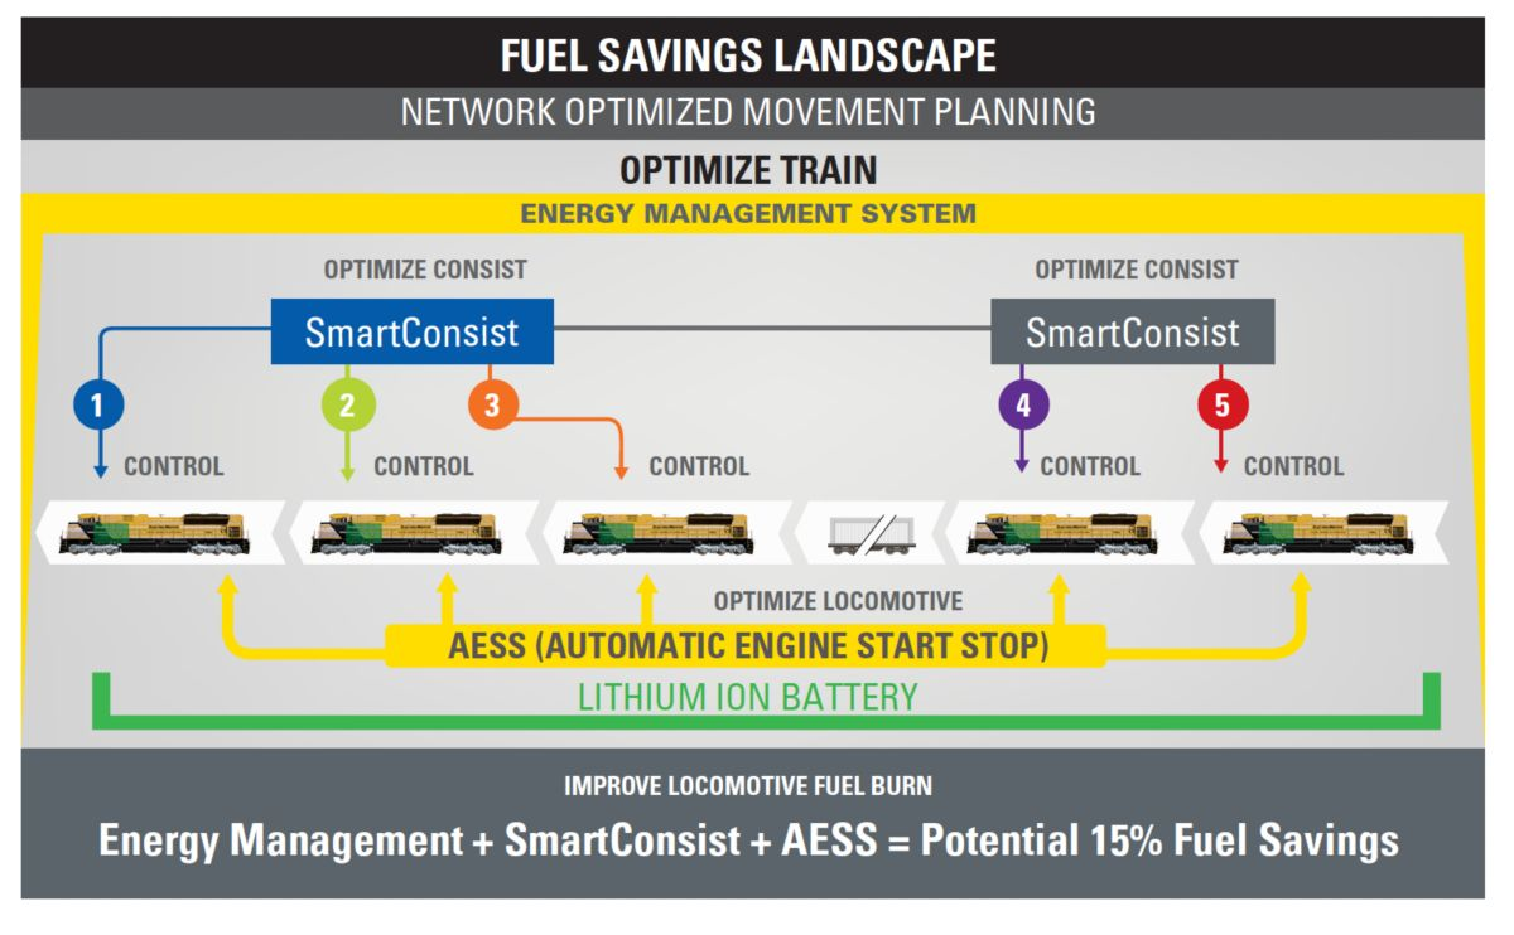 Fuel Savings Landscape